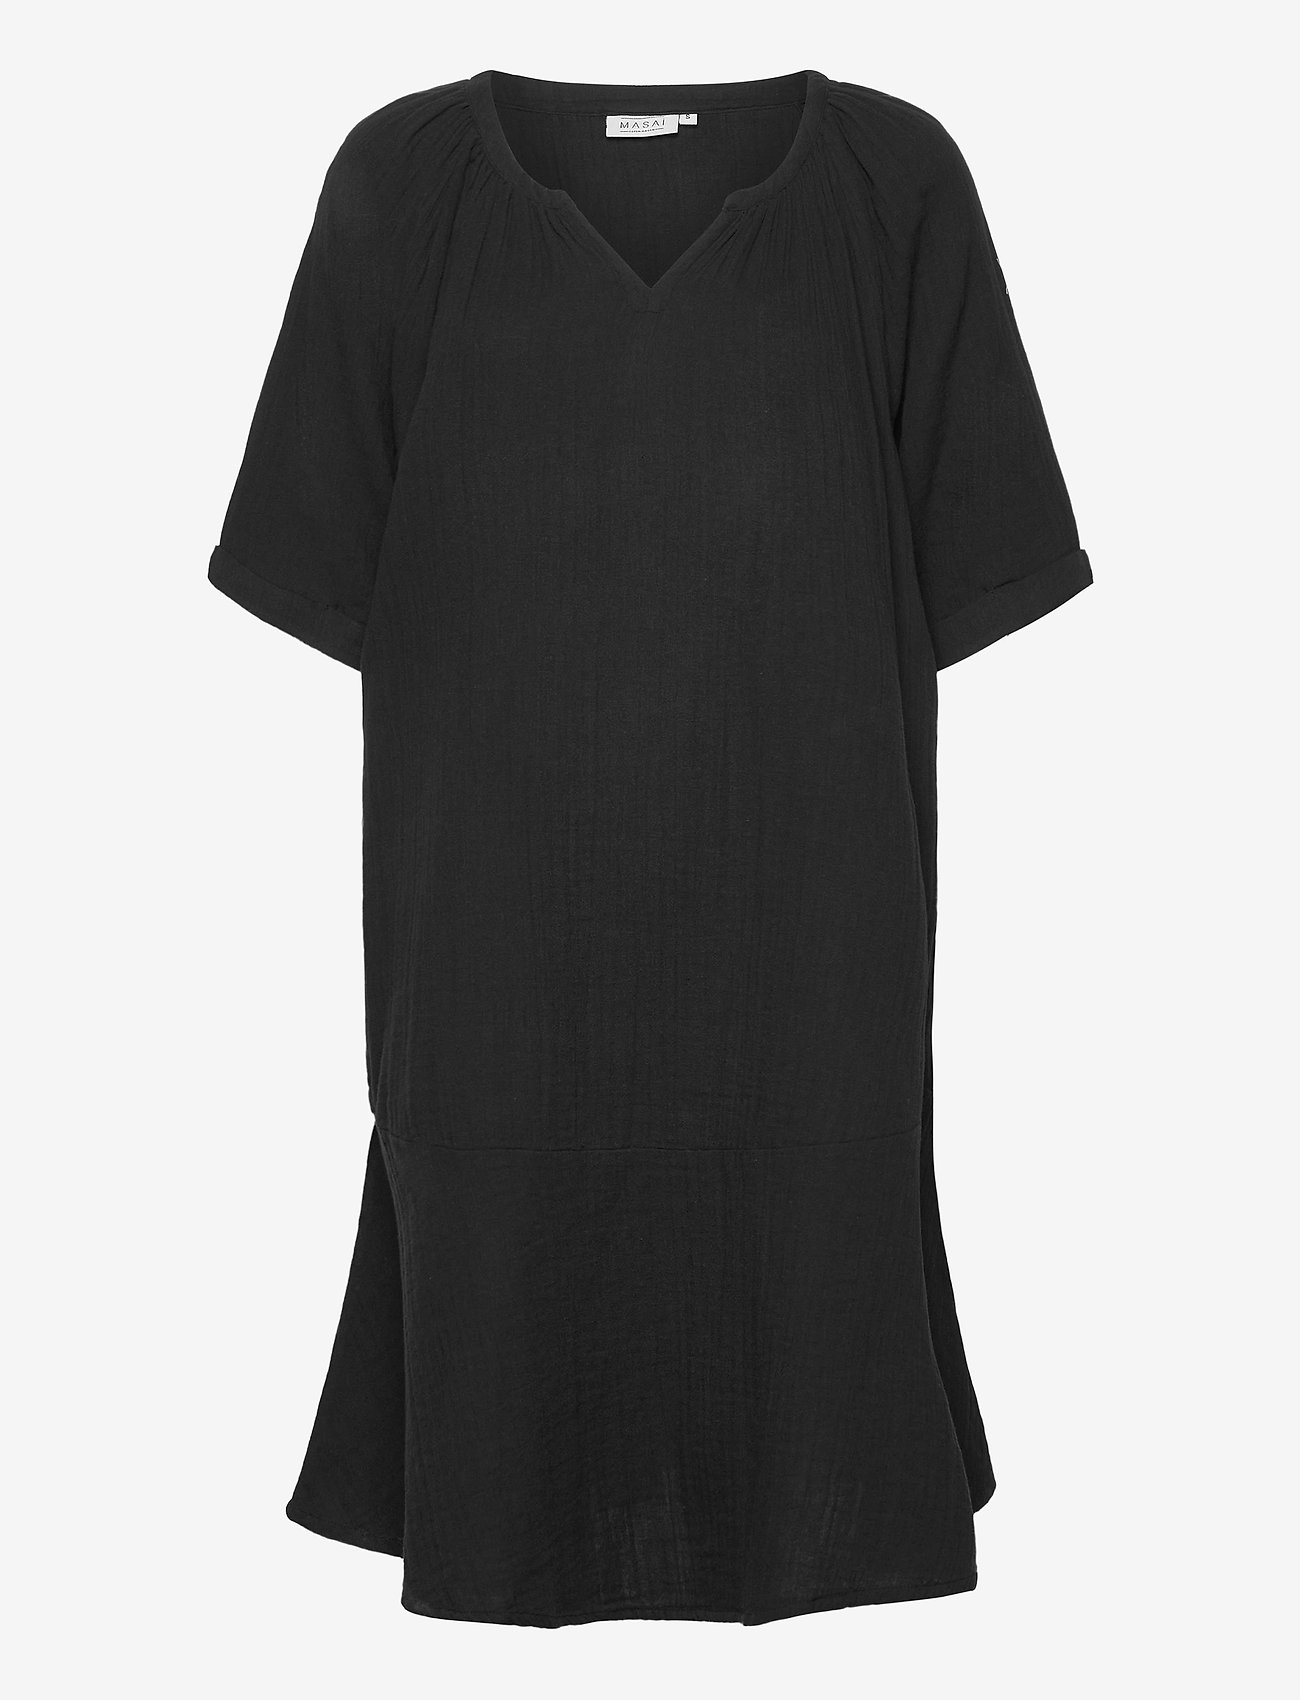 Masai - Nebis - sukienki na codzień - black - 0